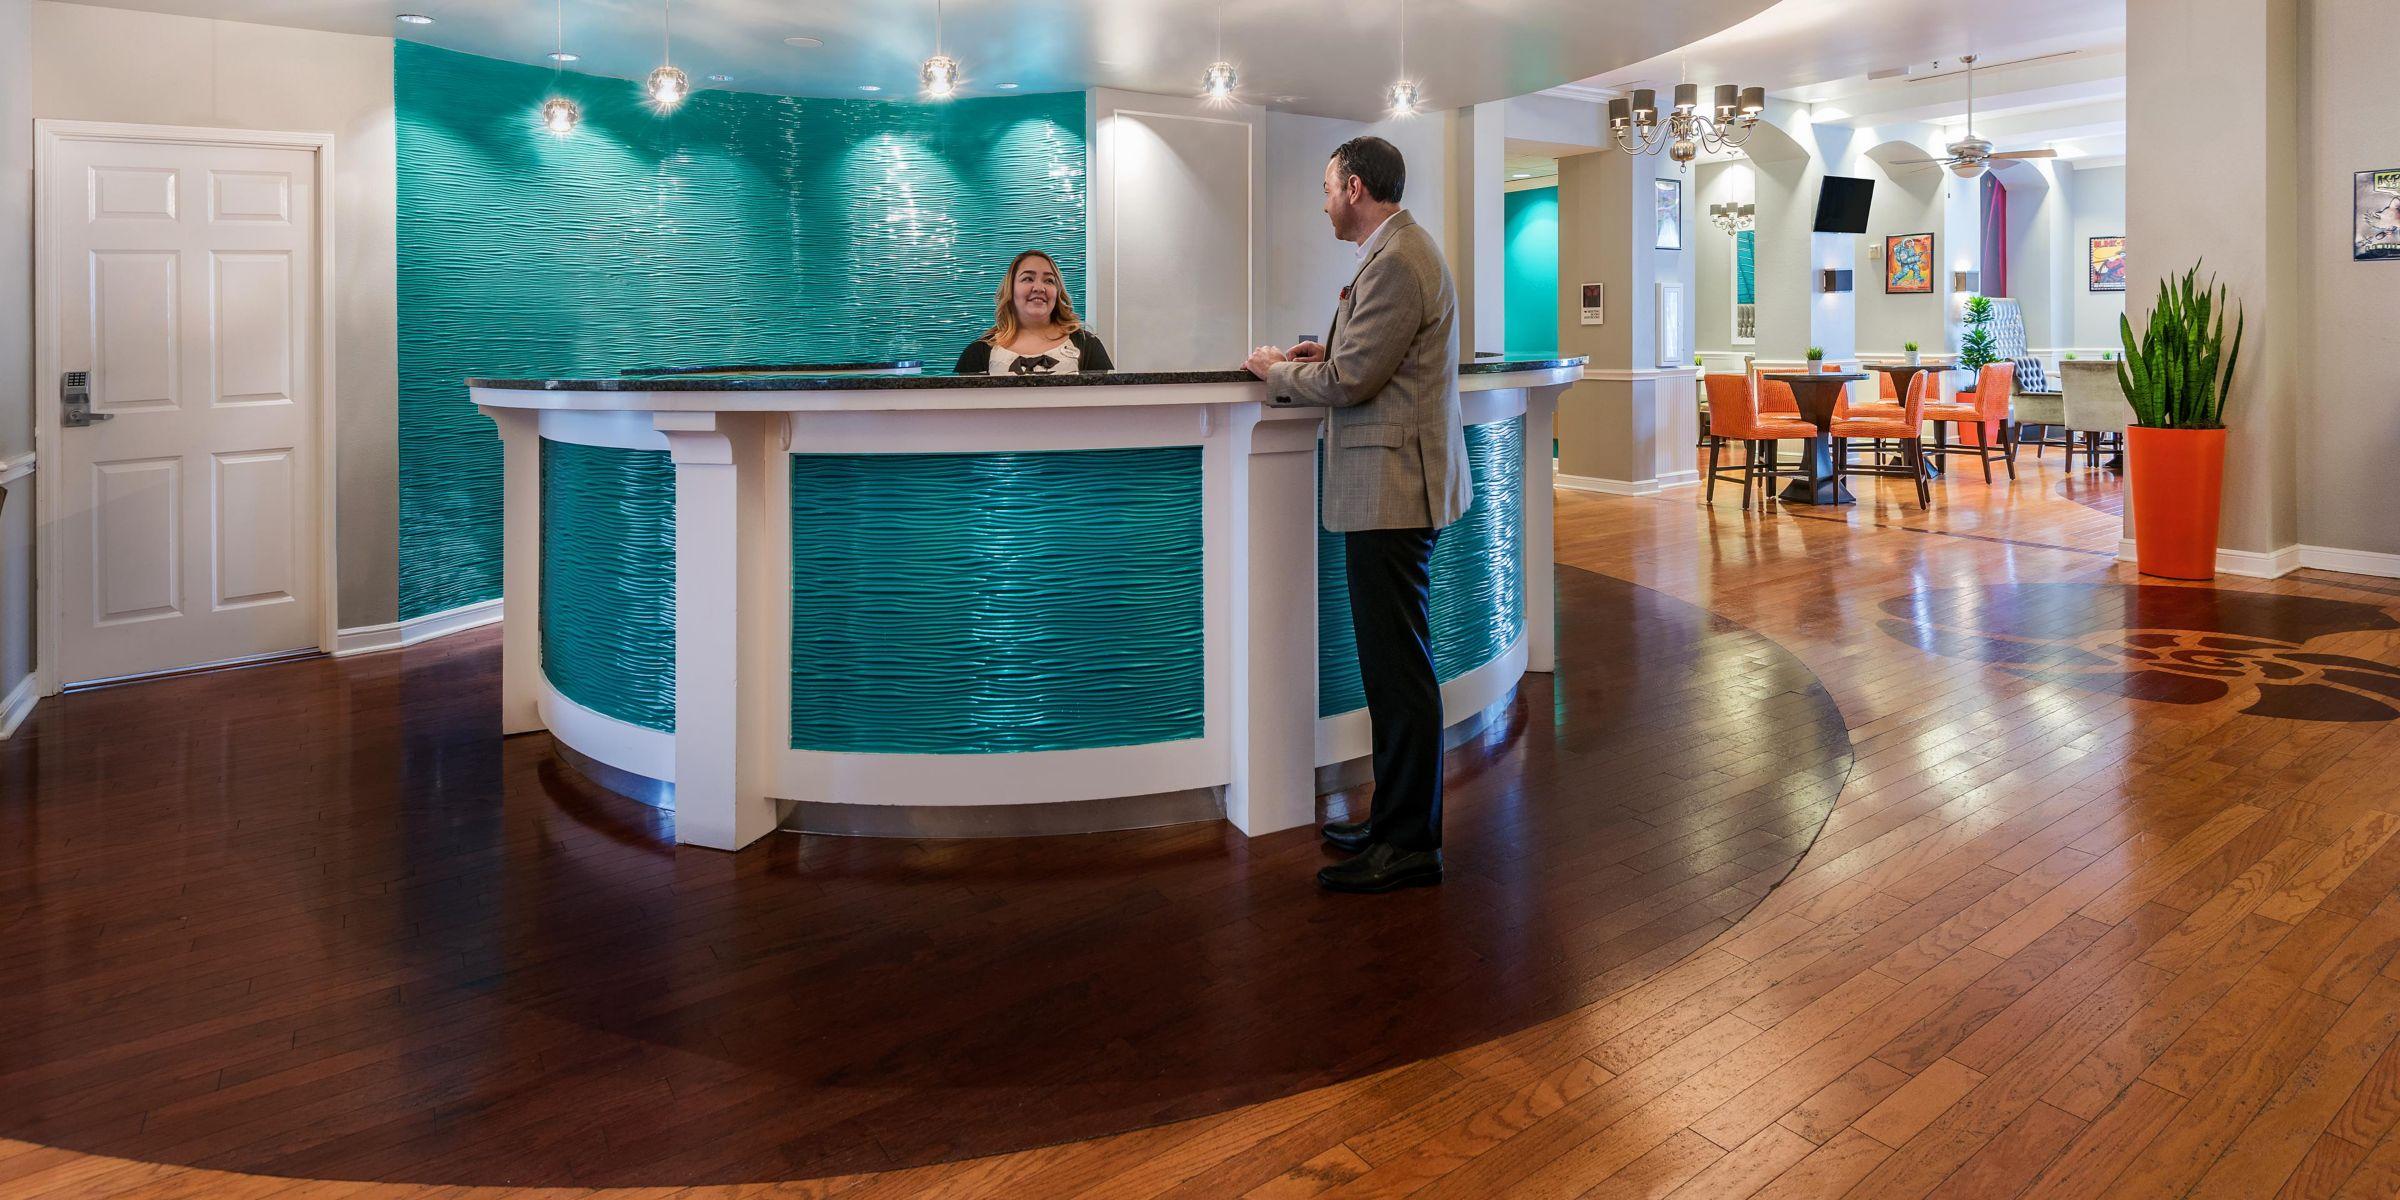 Hotel Indigo Houston at the Galleria by Holiday Inn Express